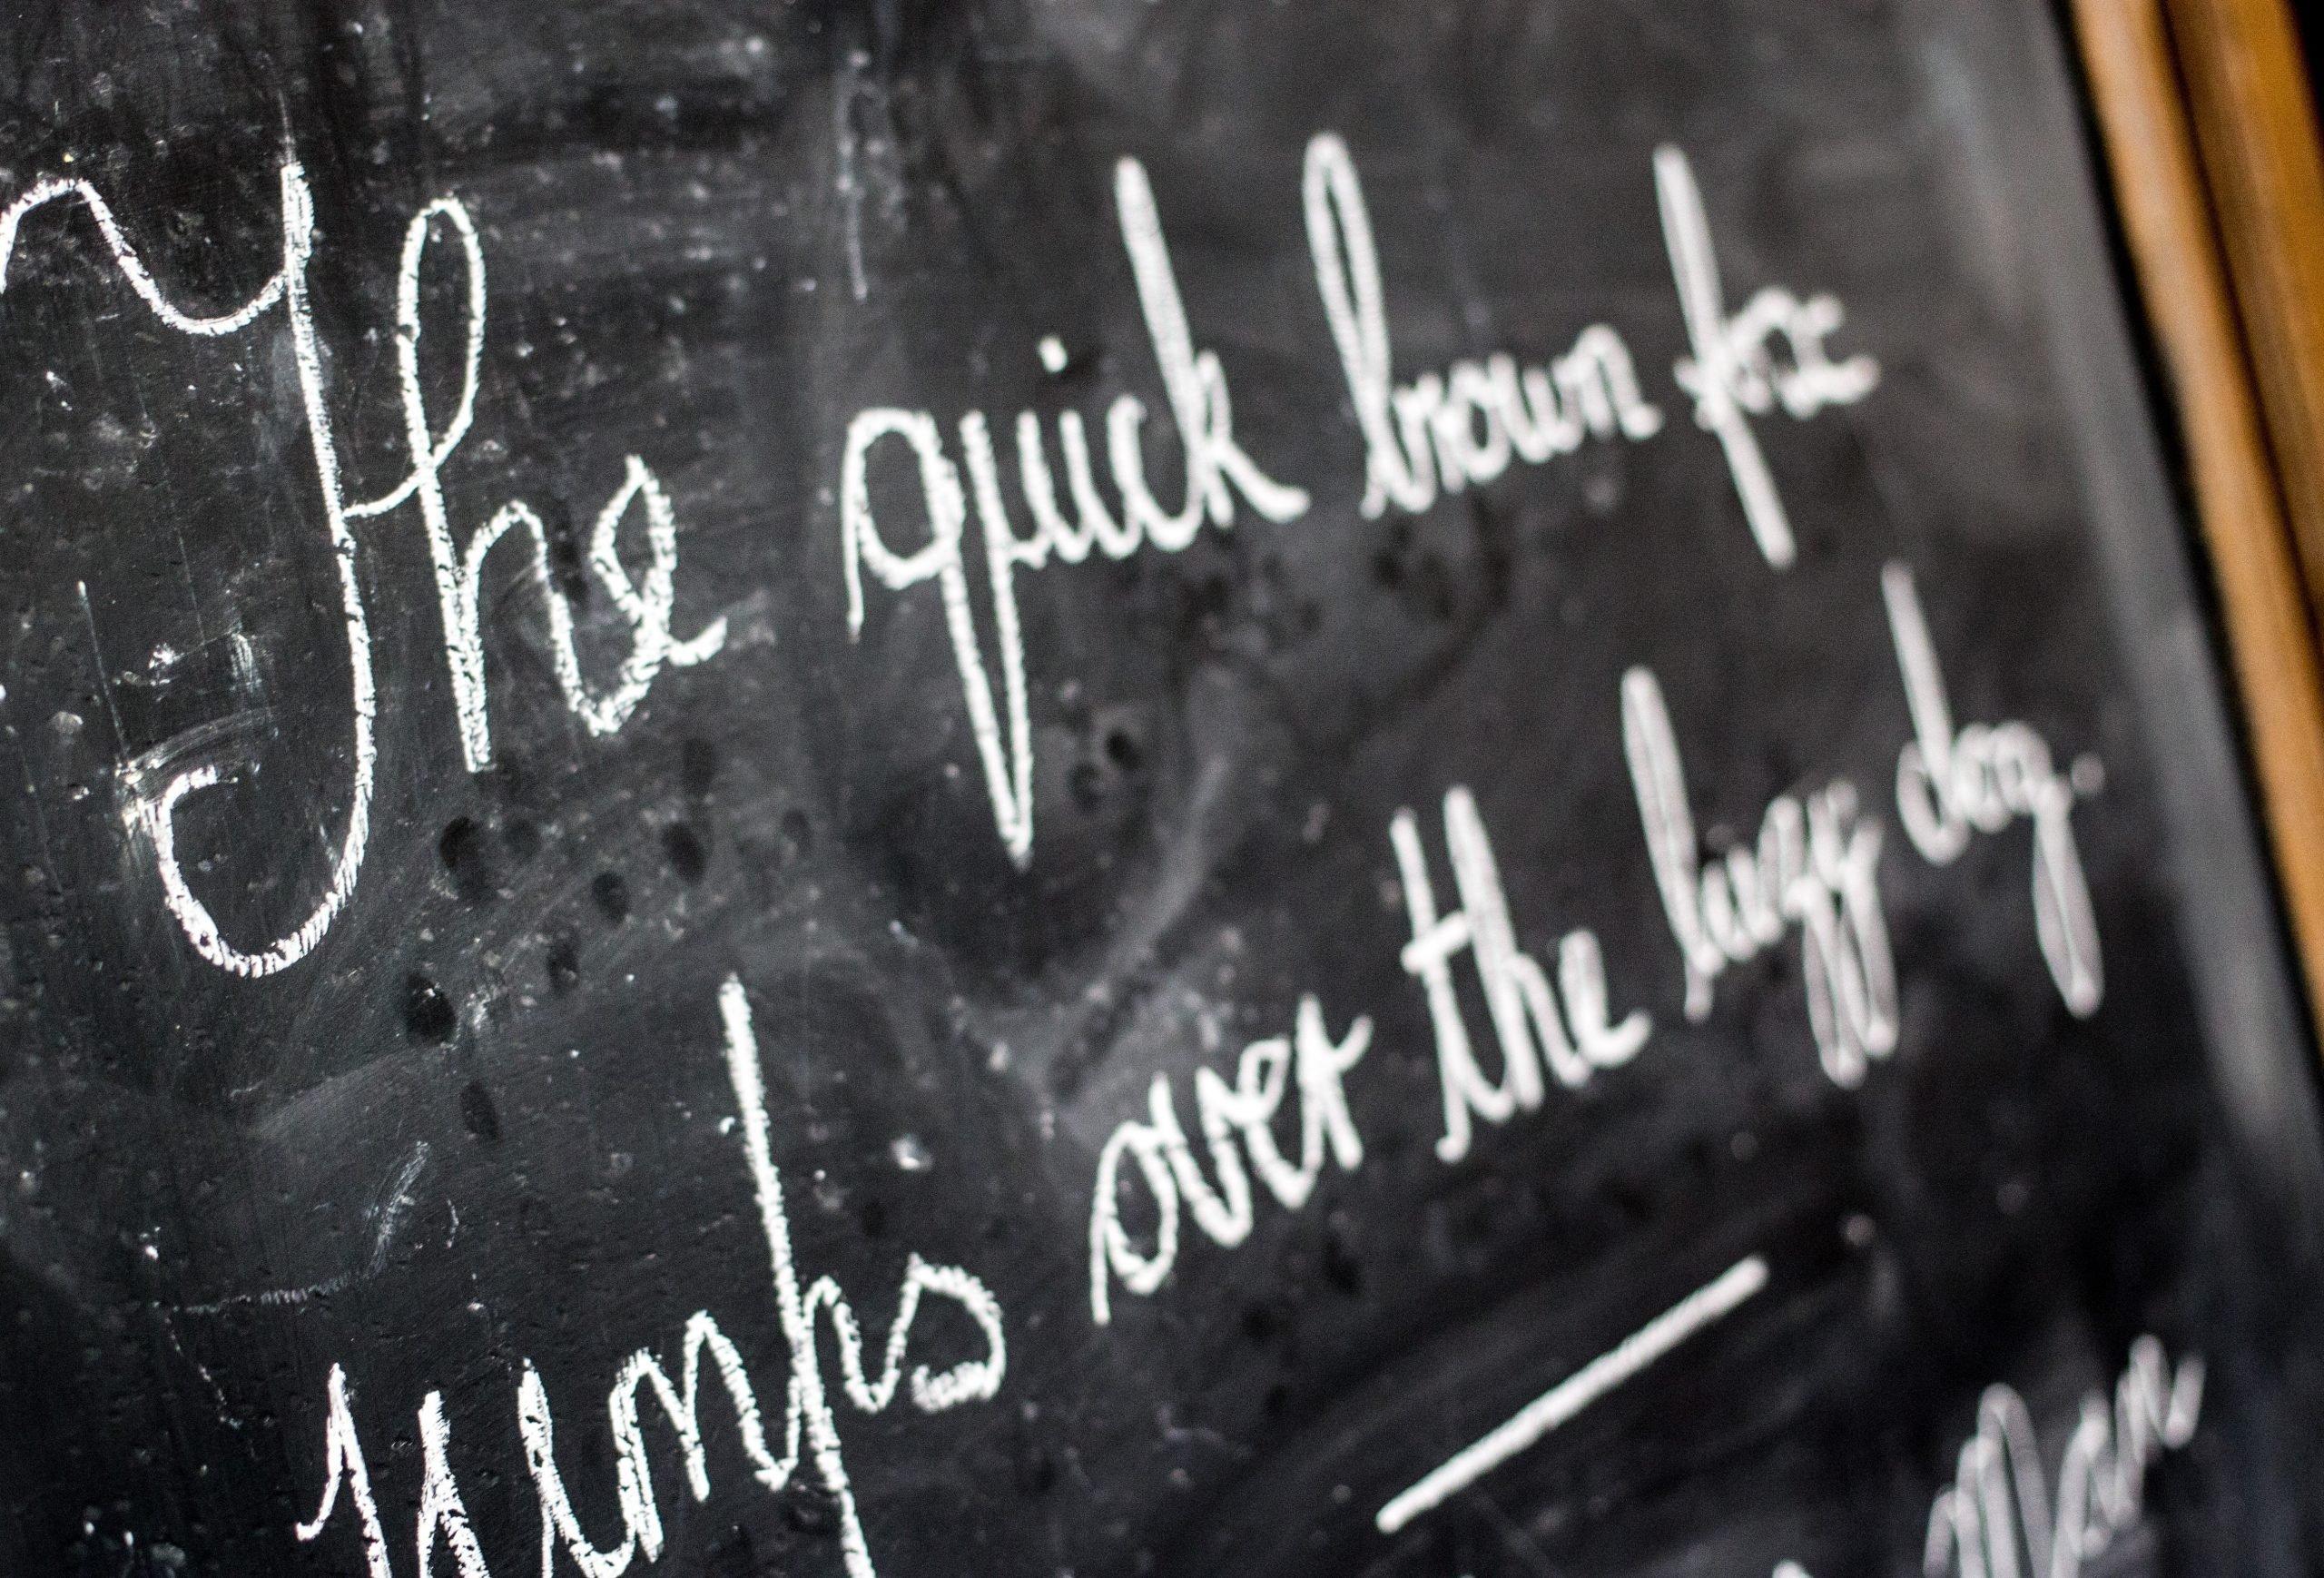 Handwriting on chalkboard in victorian style